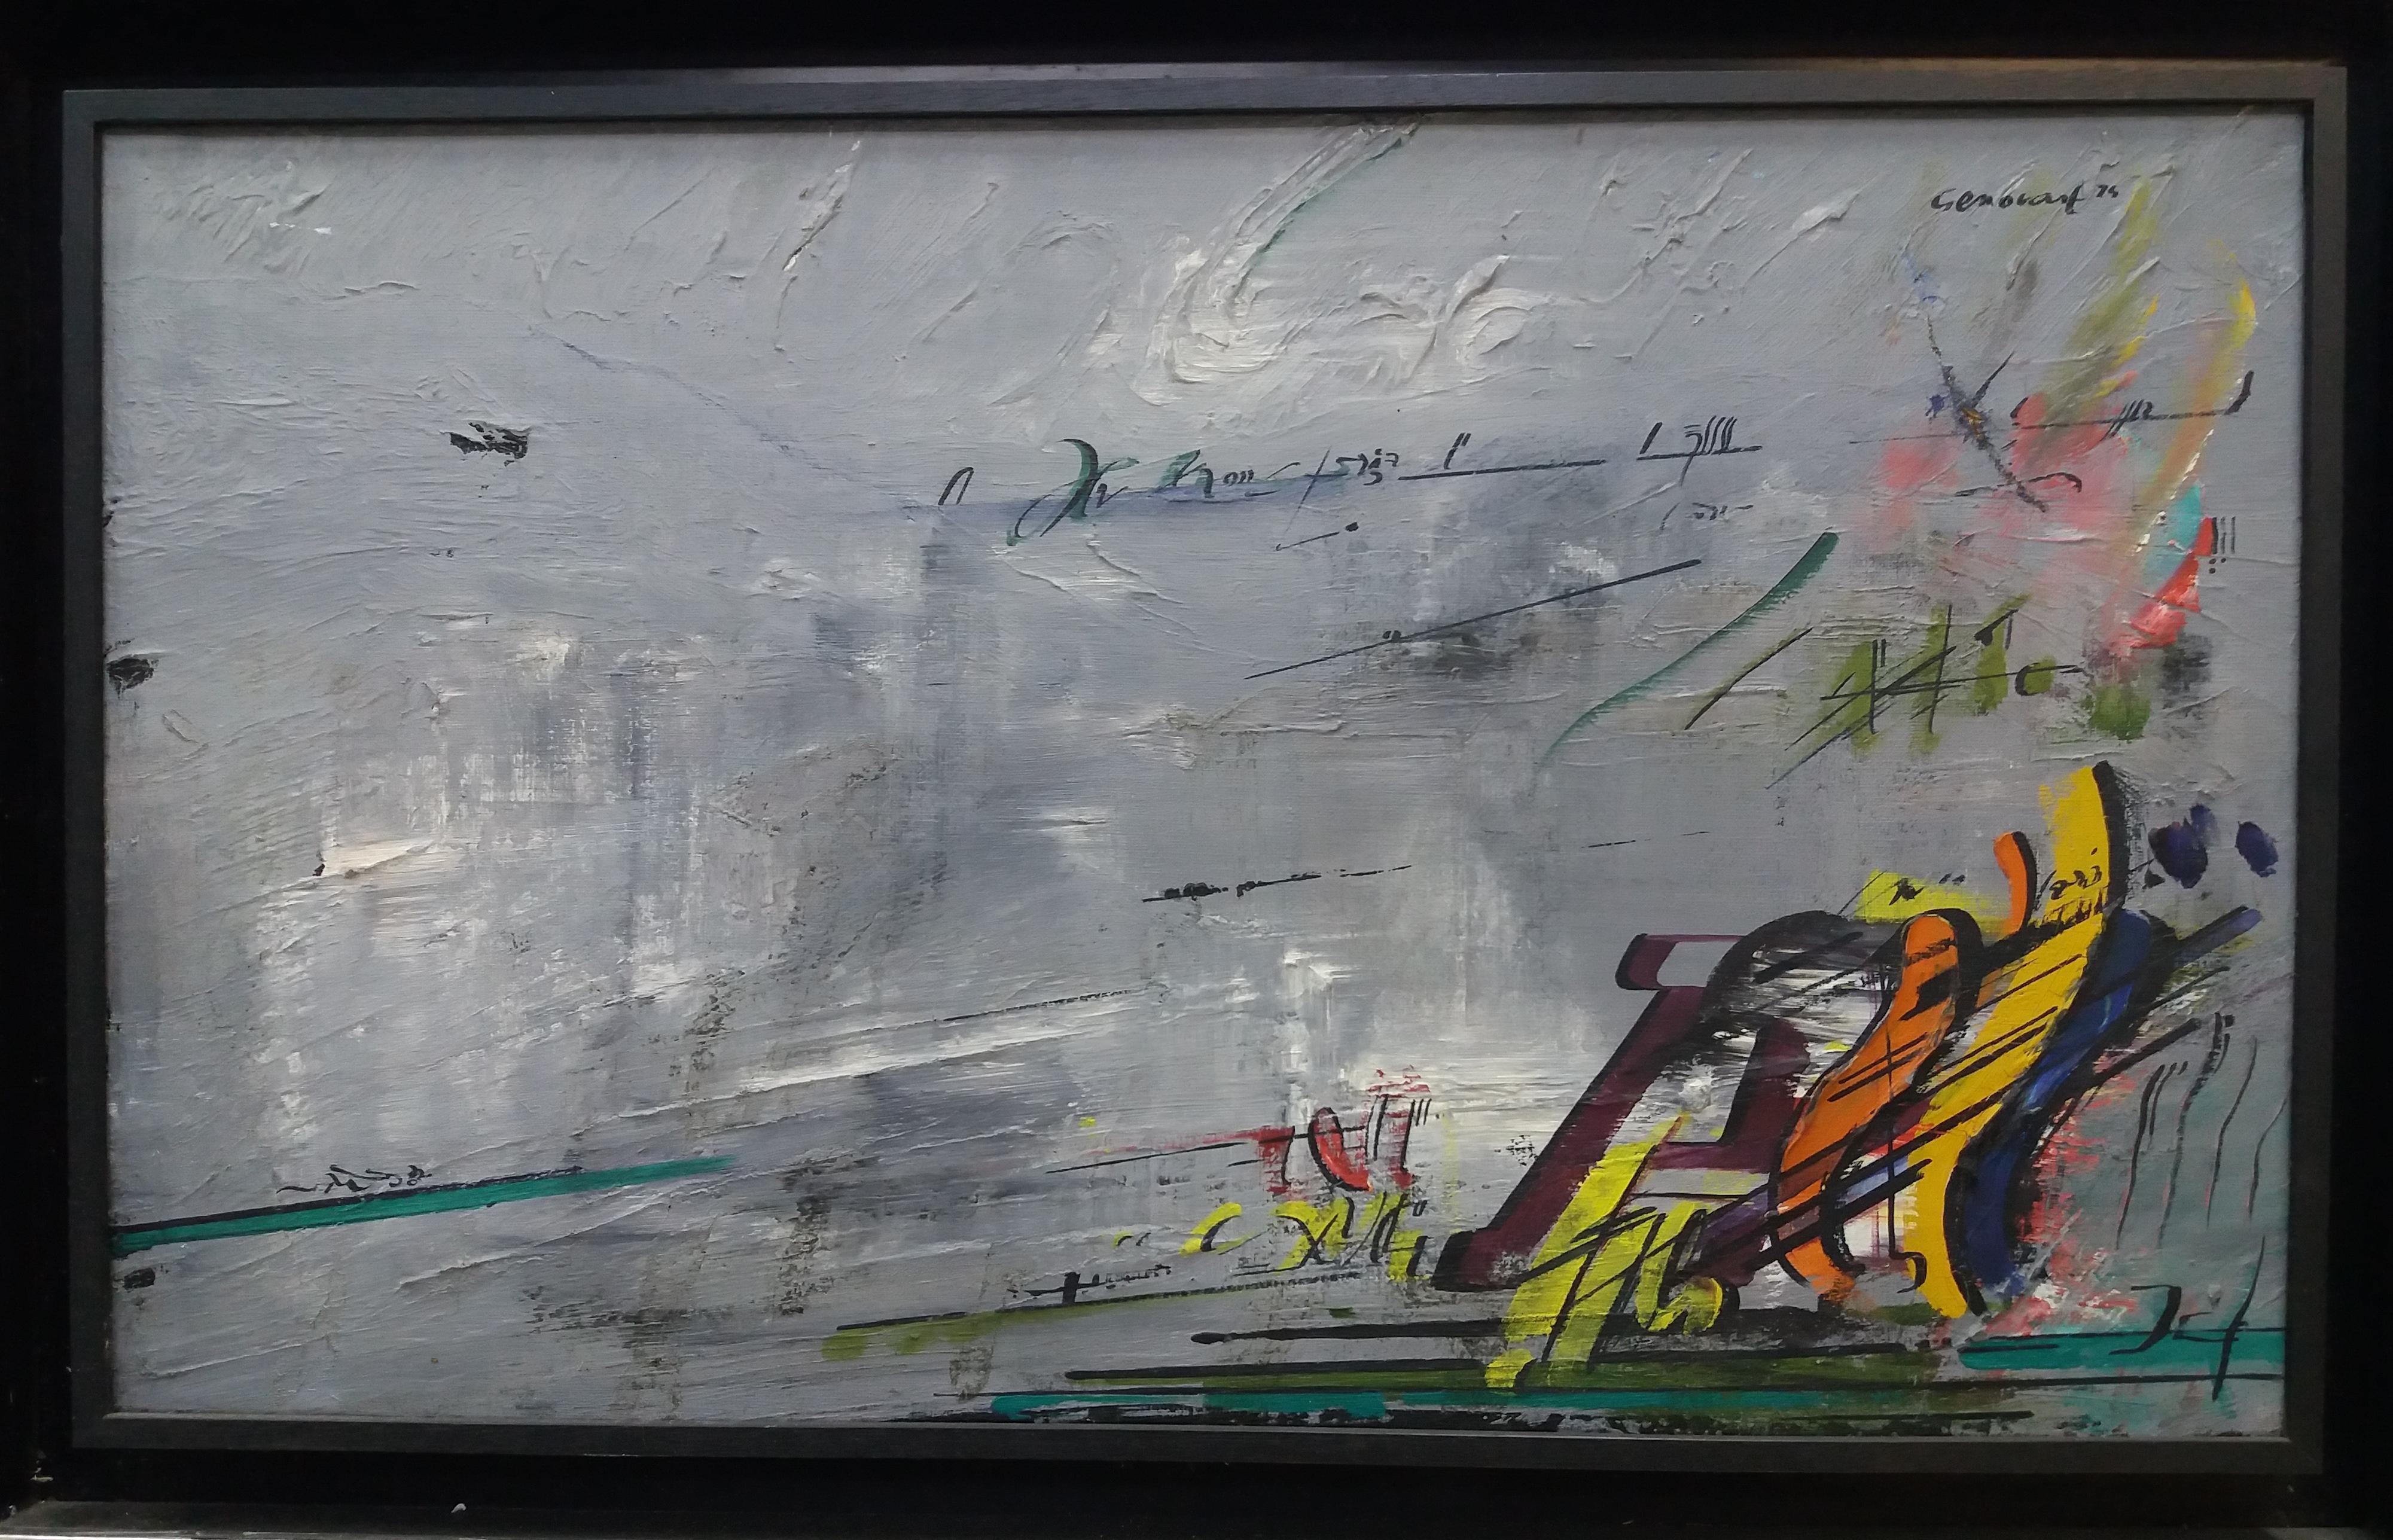 Luces original surrealist acrylic painting